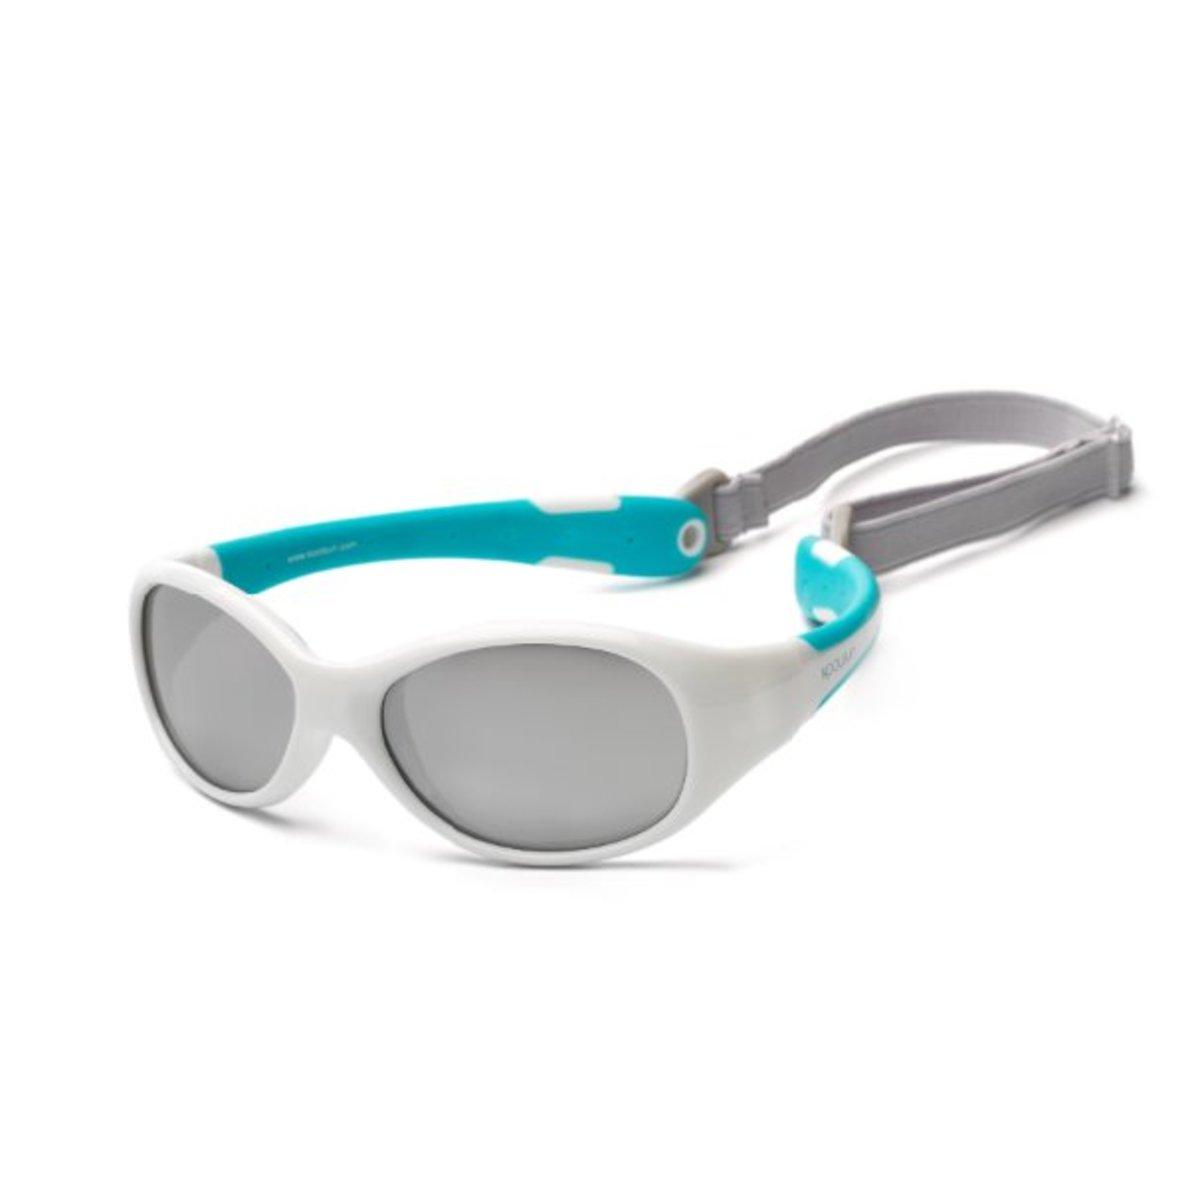 Flex 嬰兒太陽眼鏡 白水藍 (3-6歲)